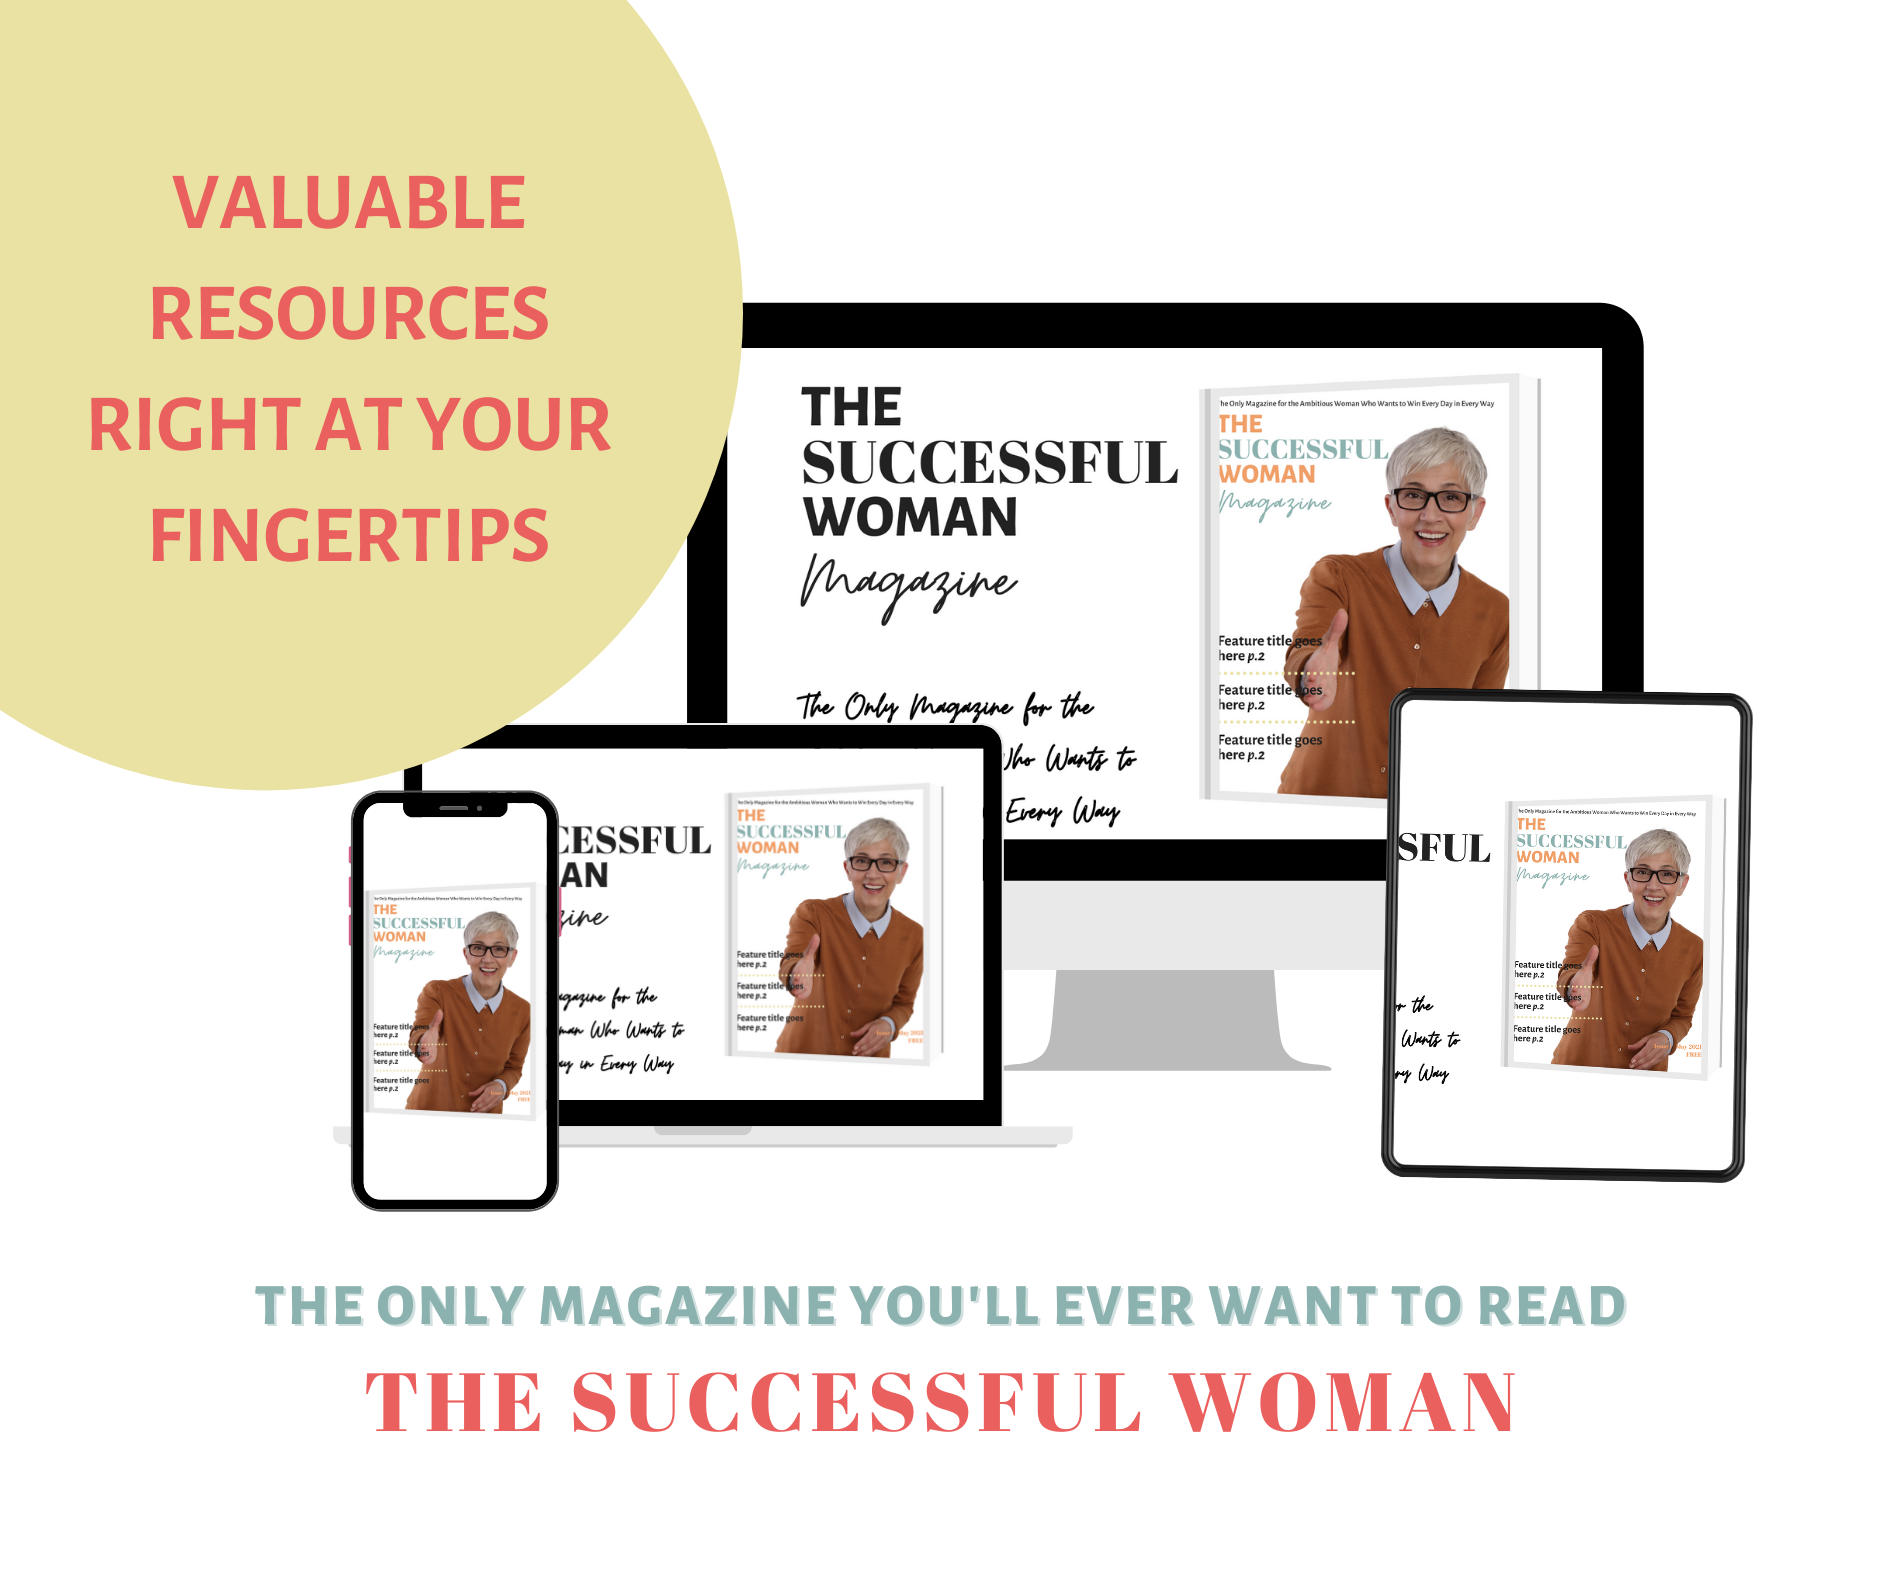 The Successful Woman Magazine ad